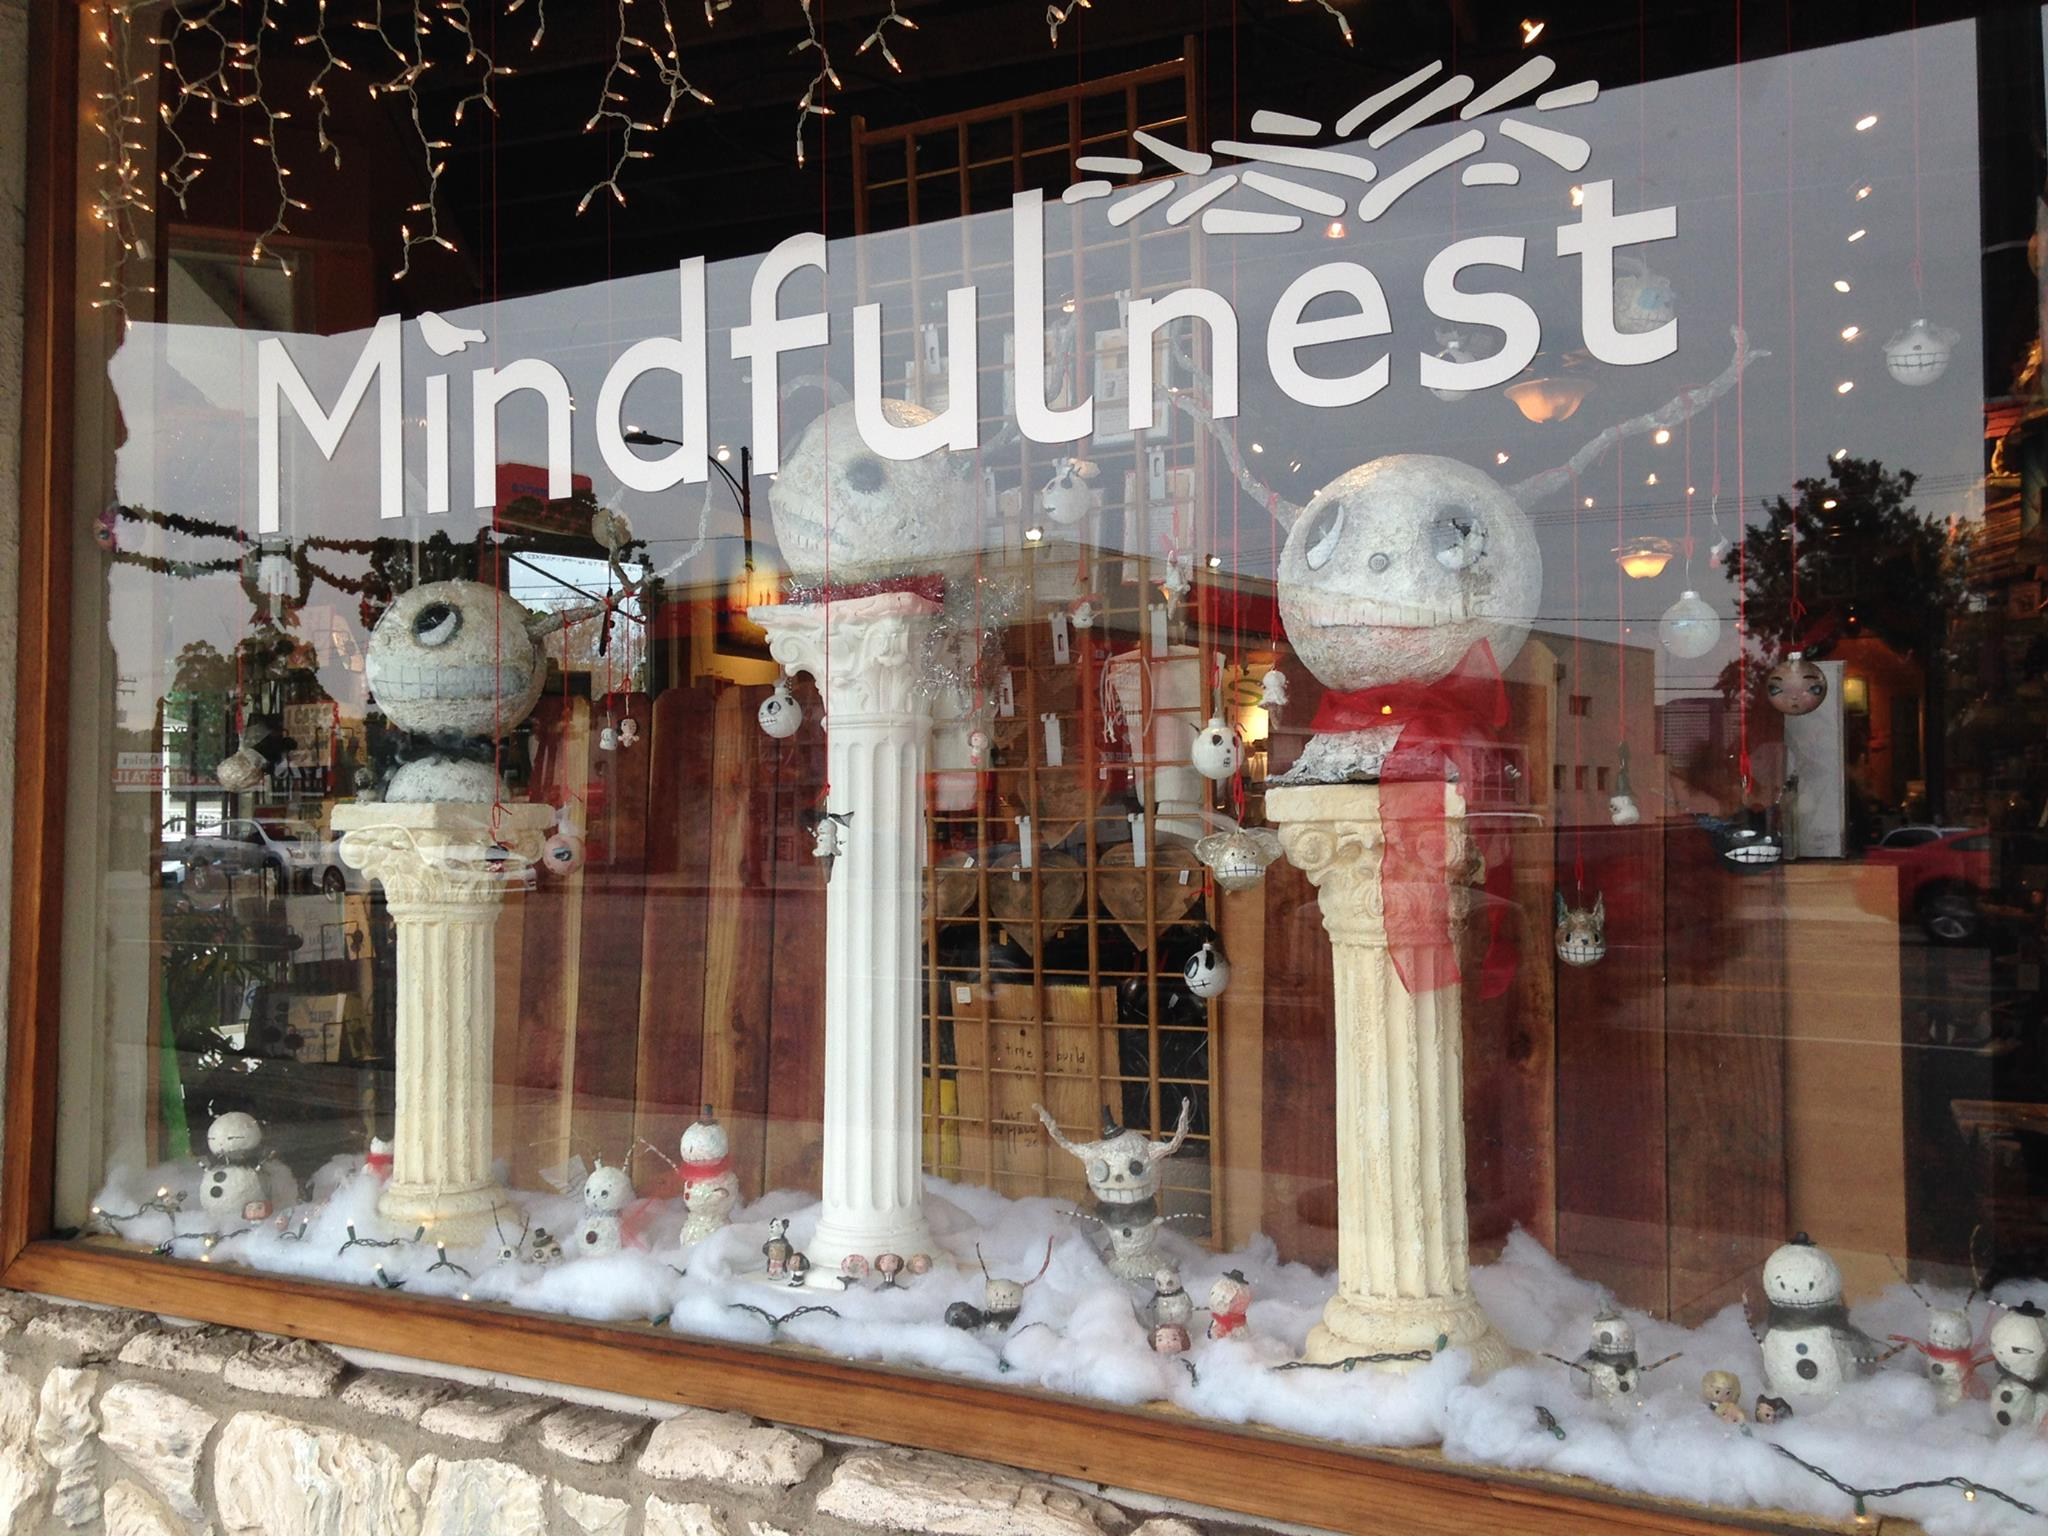 Snowheads window for Mindfulnest Burbank, CA